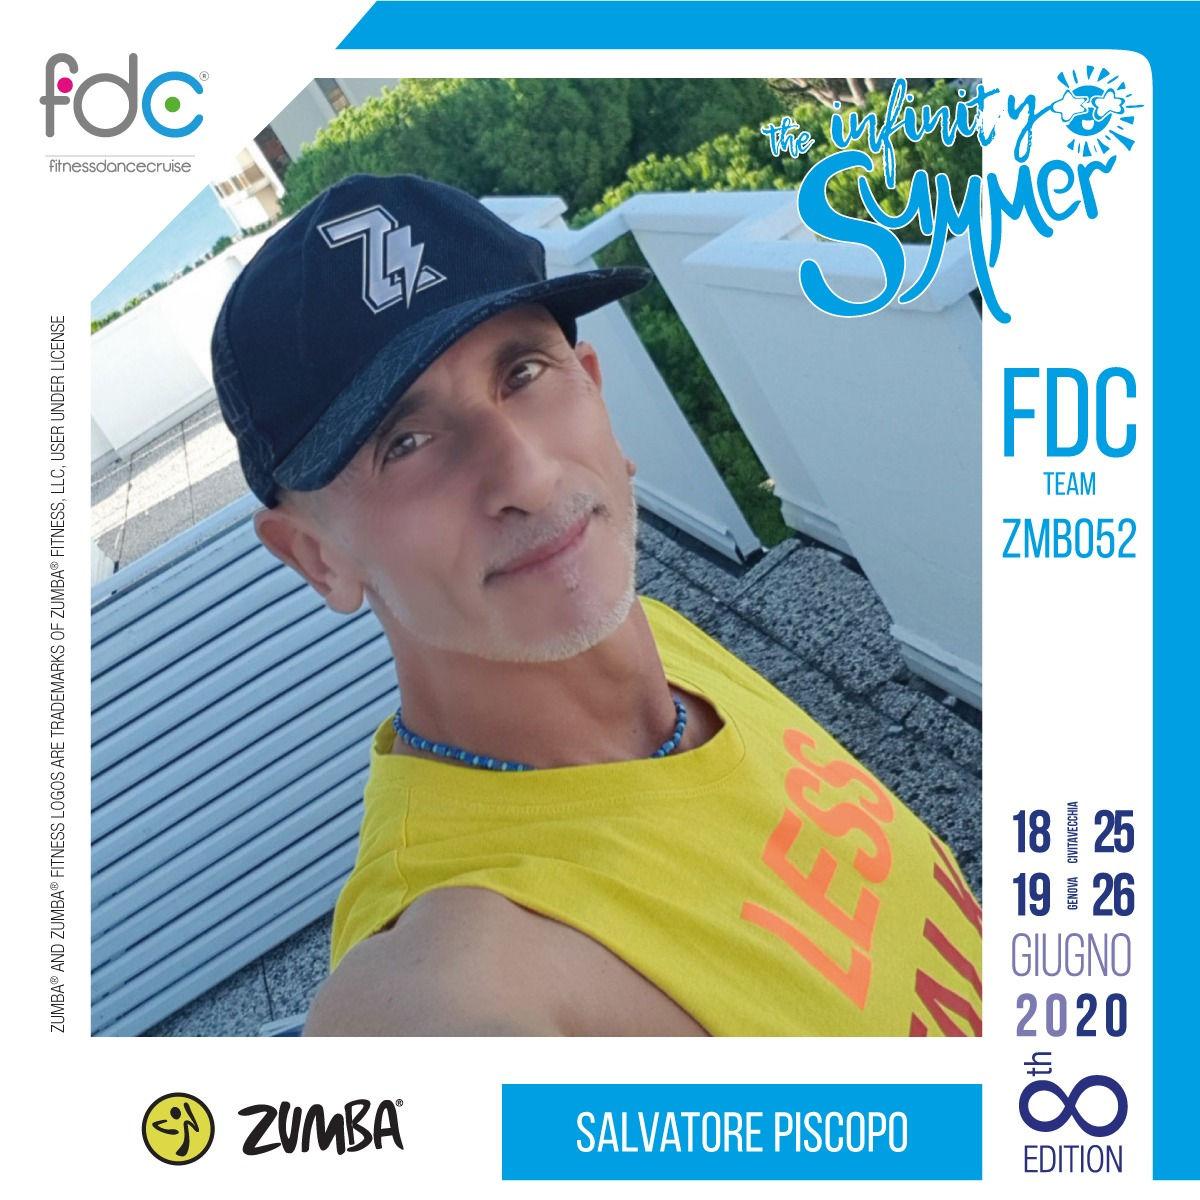 FDC Team Salvatore Piscopo